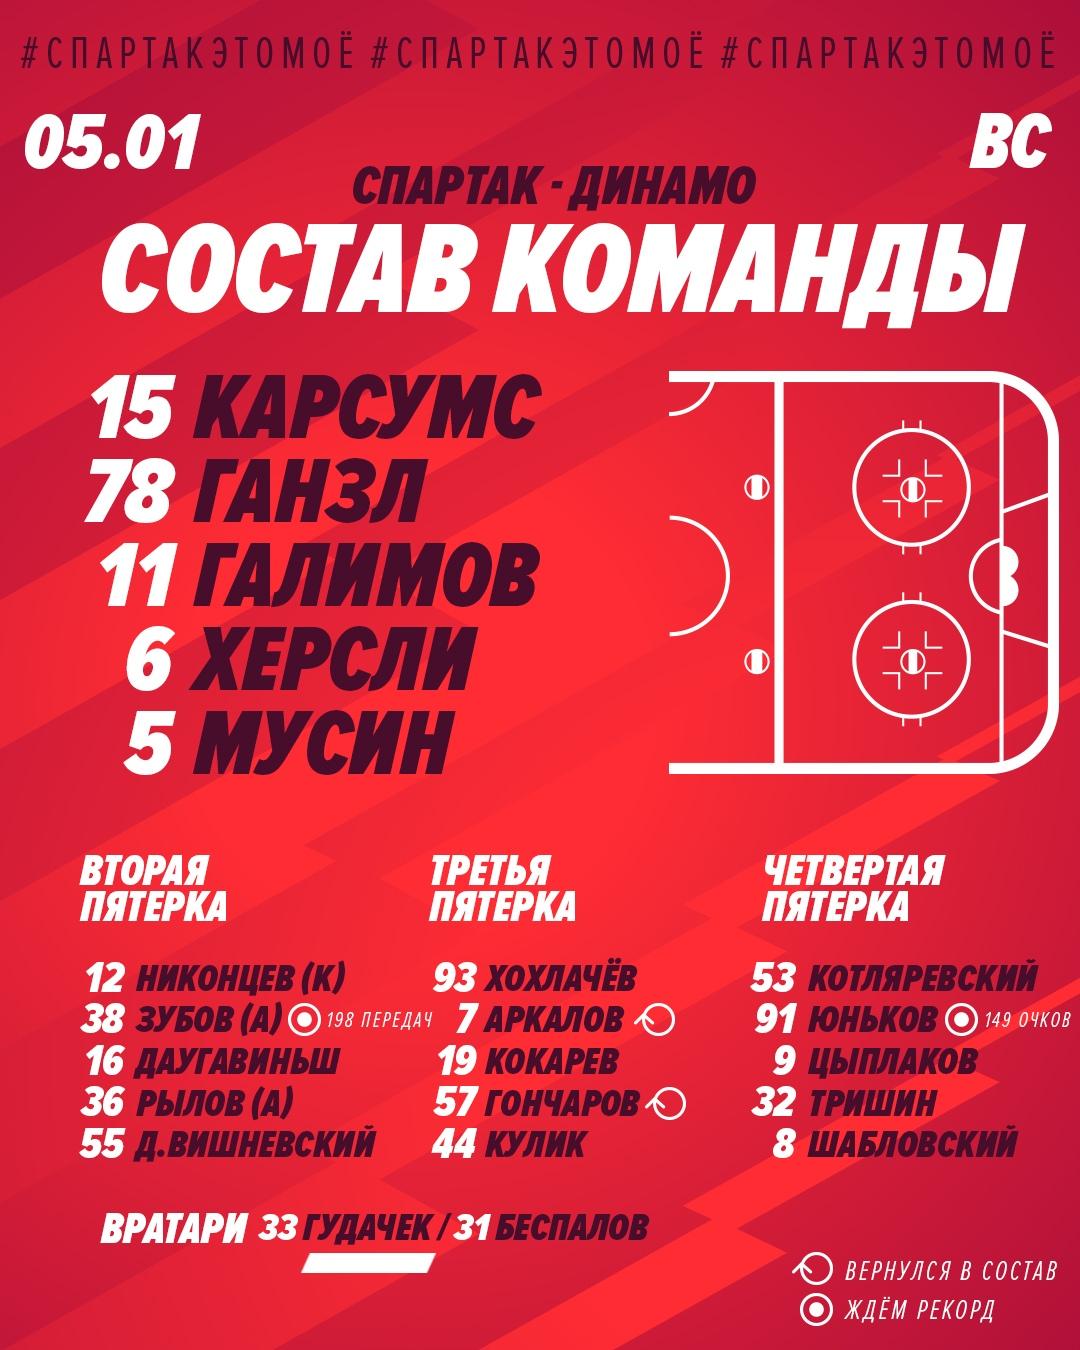 Состав «Спартака» на дерби с «Динамо»